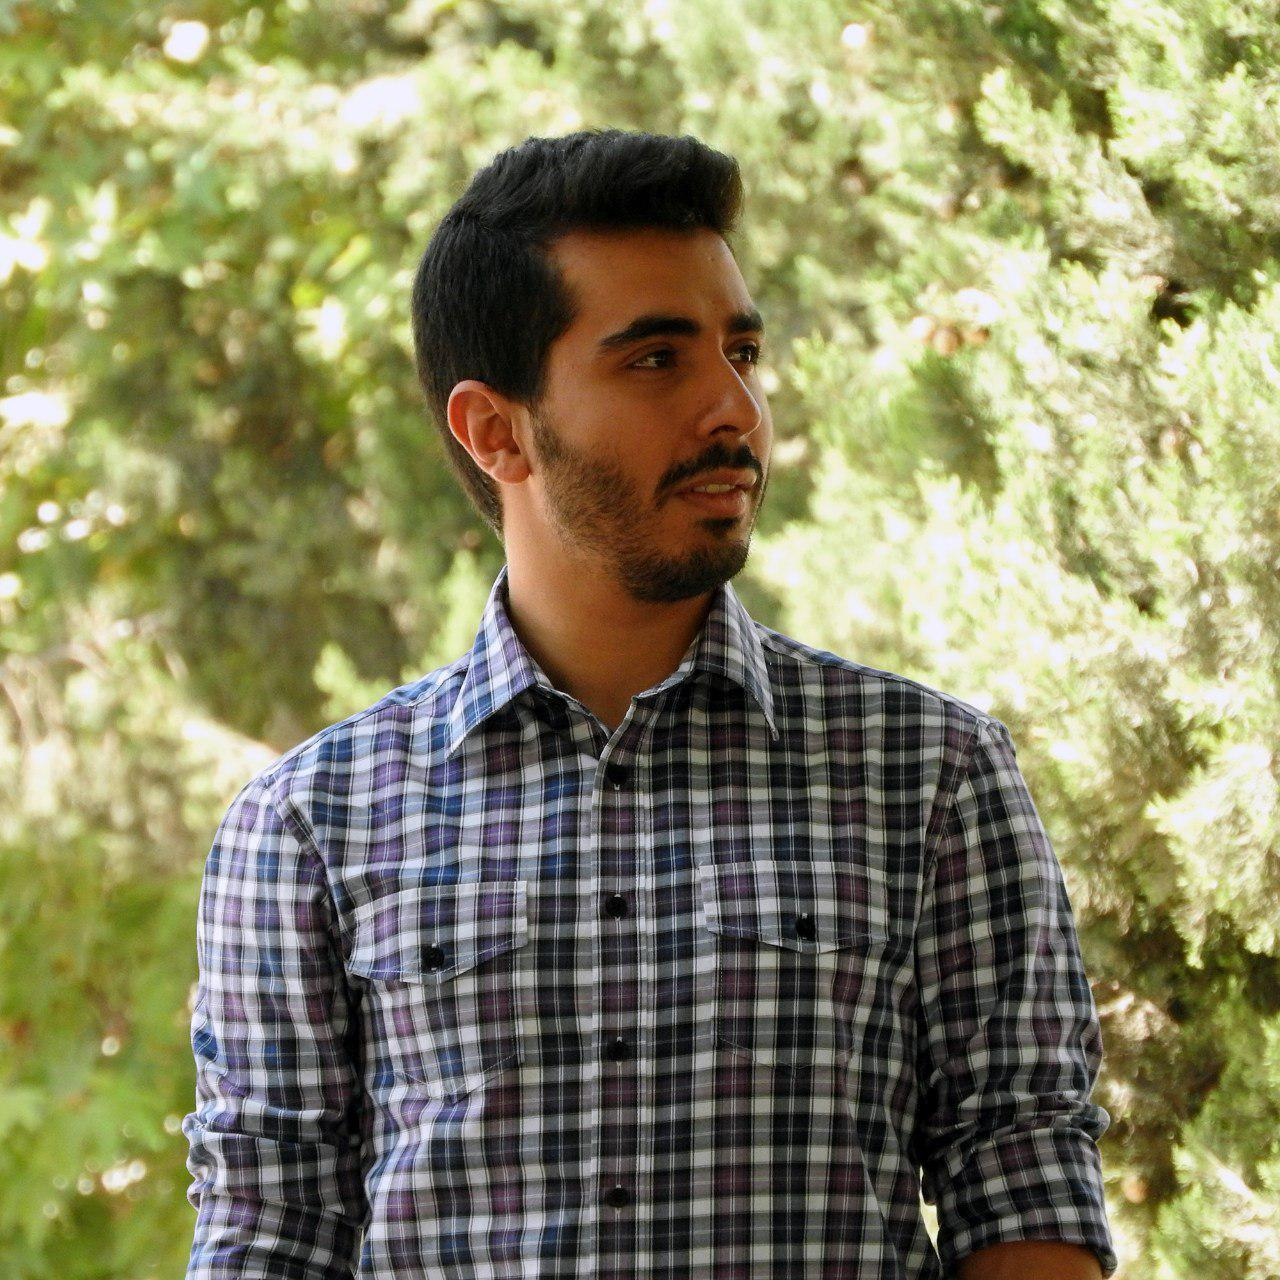 Sahand Kalantary